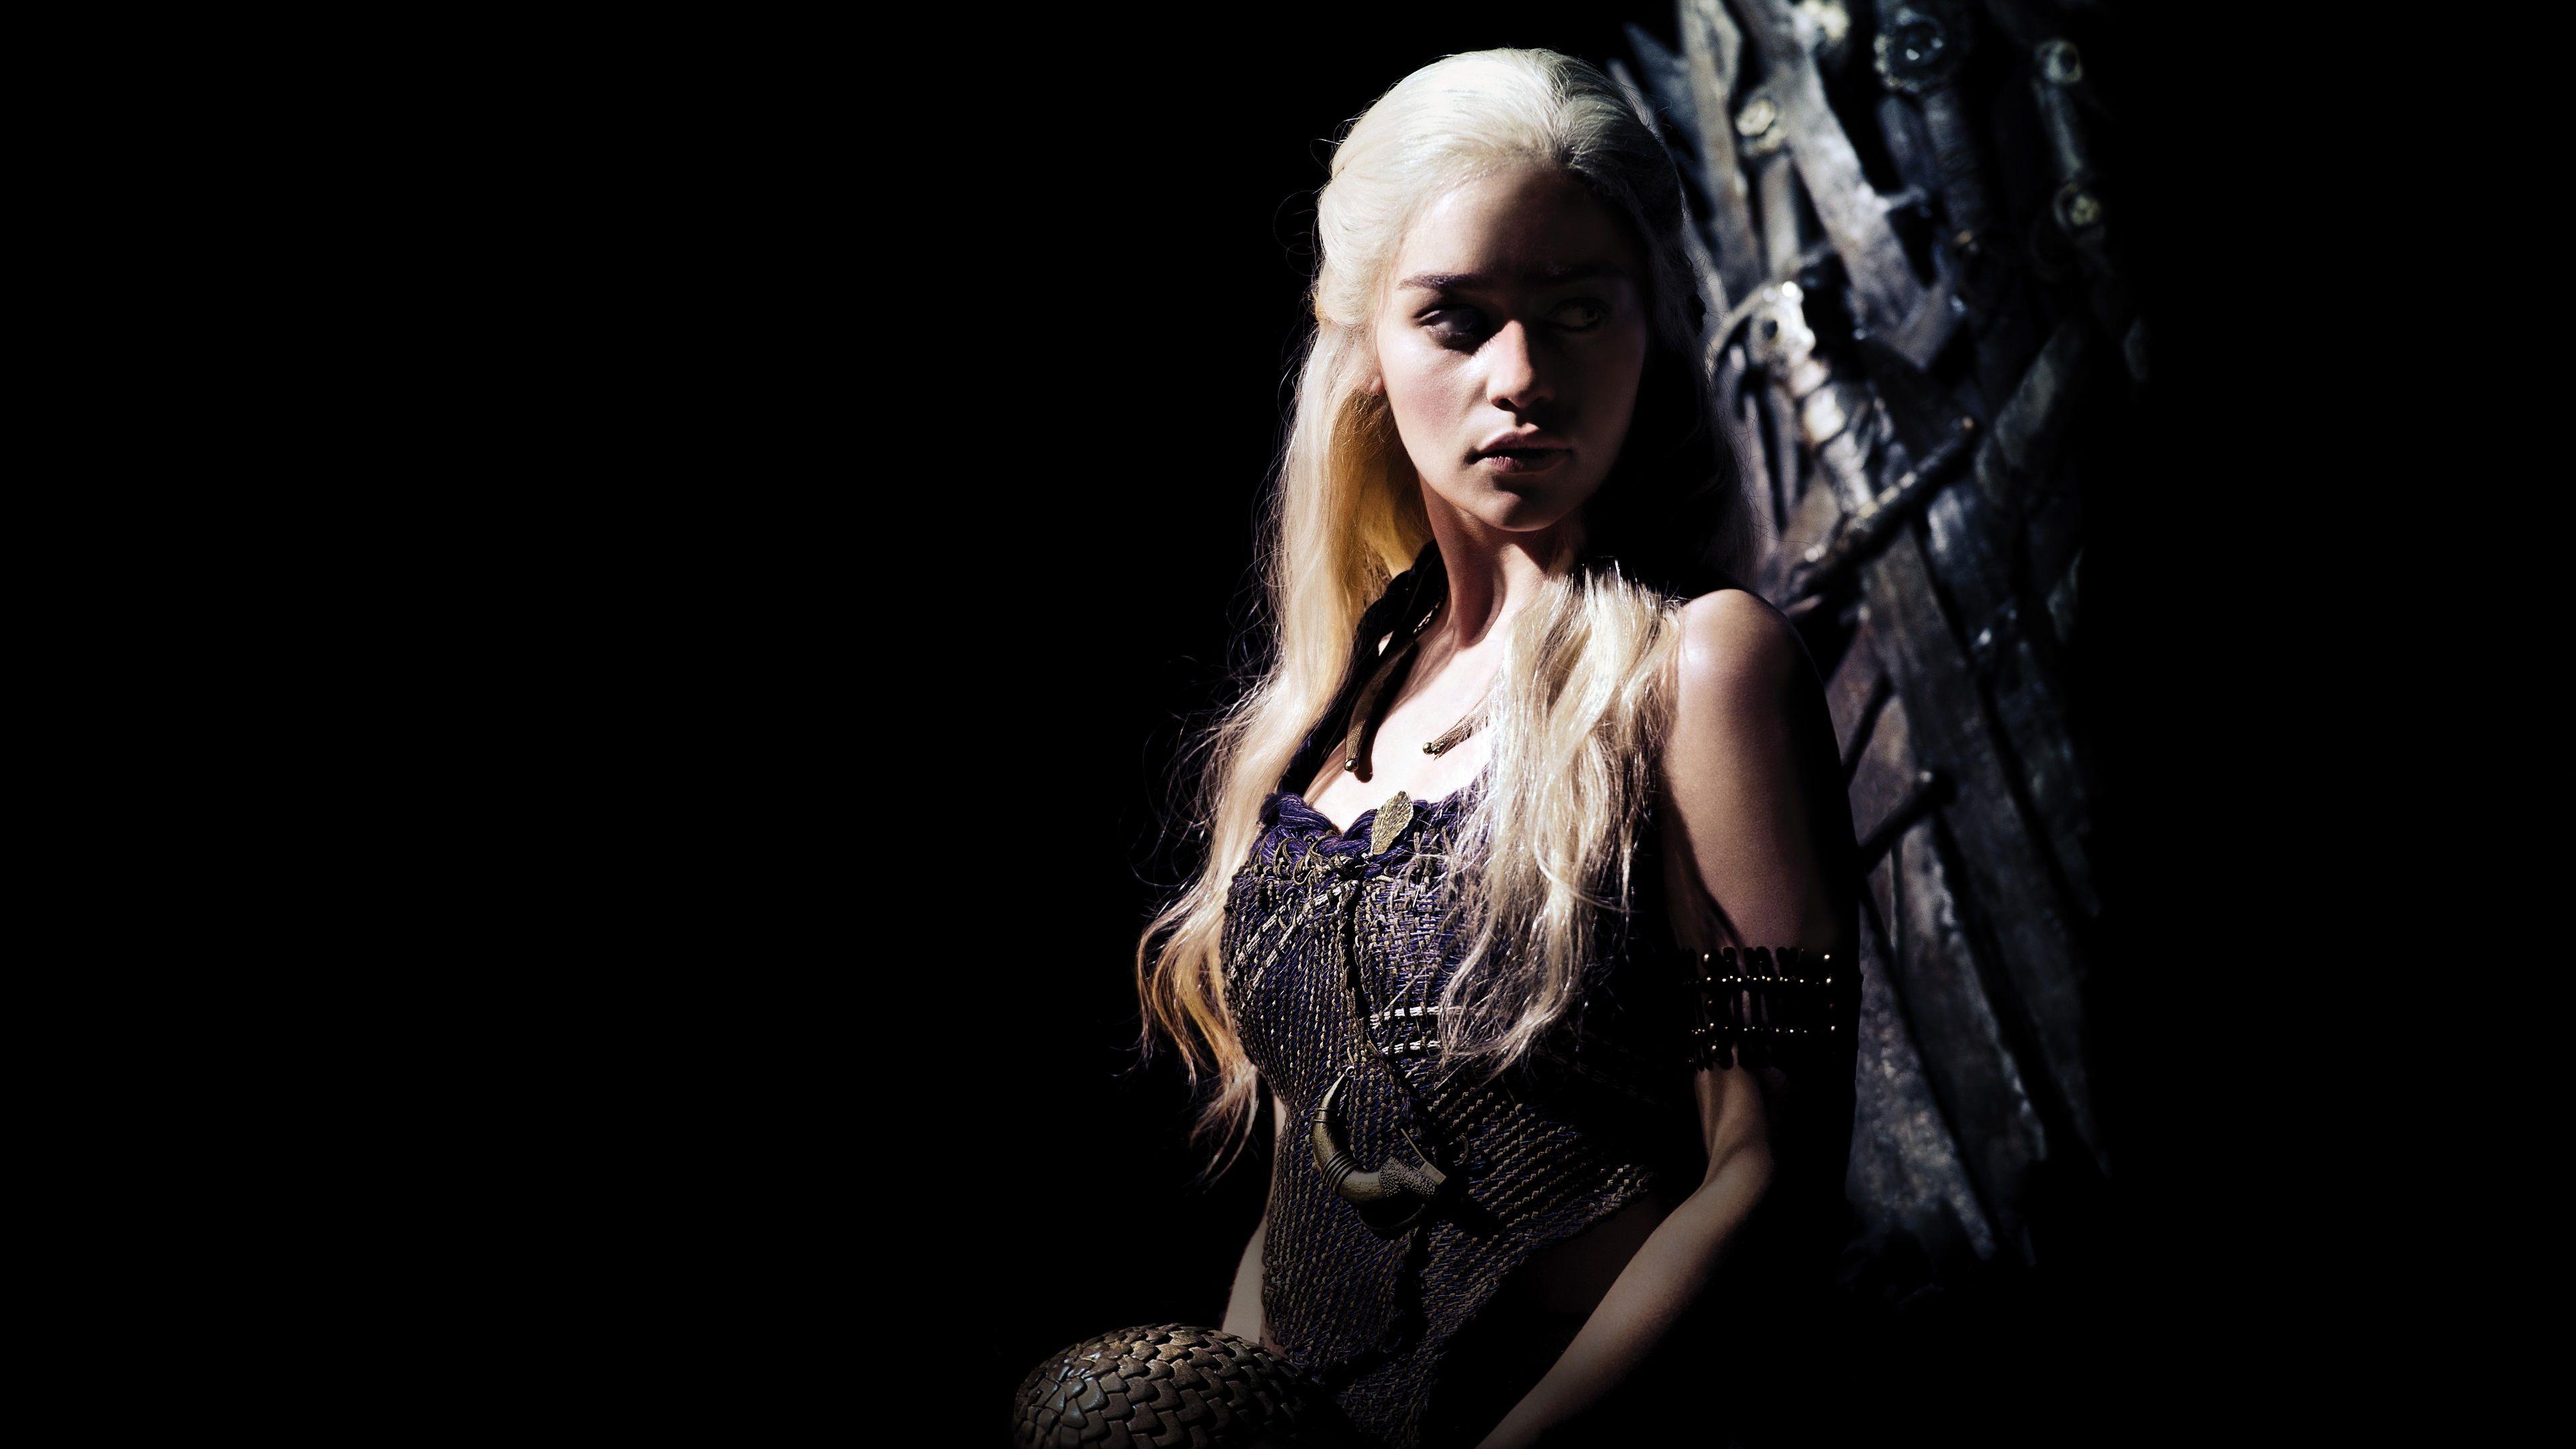 3840x2160 Daenerys Targaryen 4k Wallpaper Photo Download Free Game Of Thrones Costumes Game Of Throne Daenerys Photo